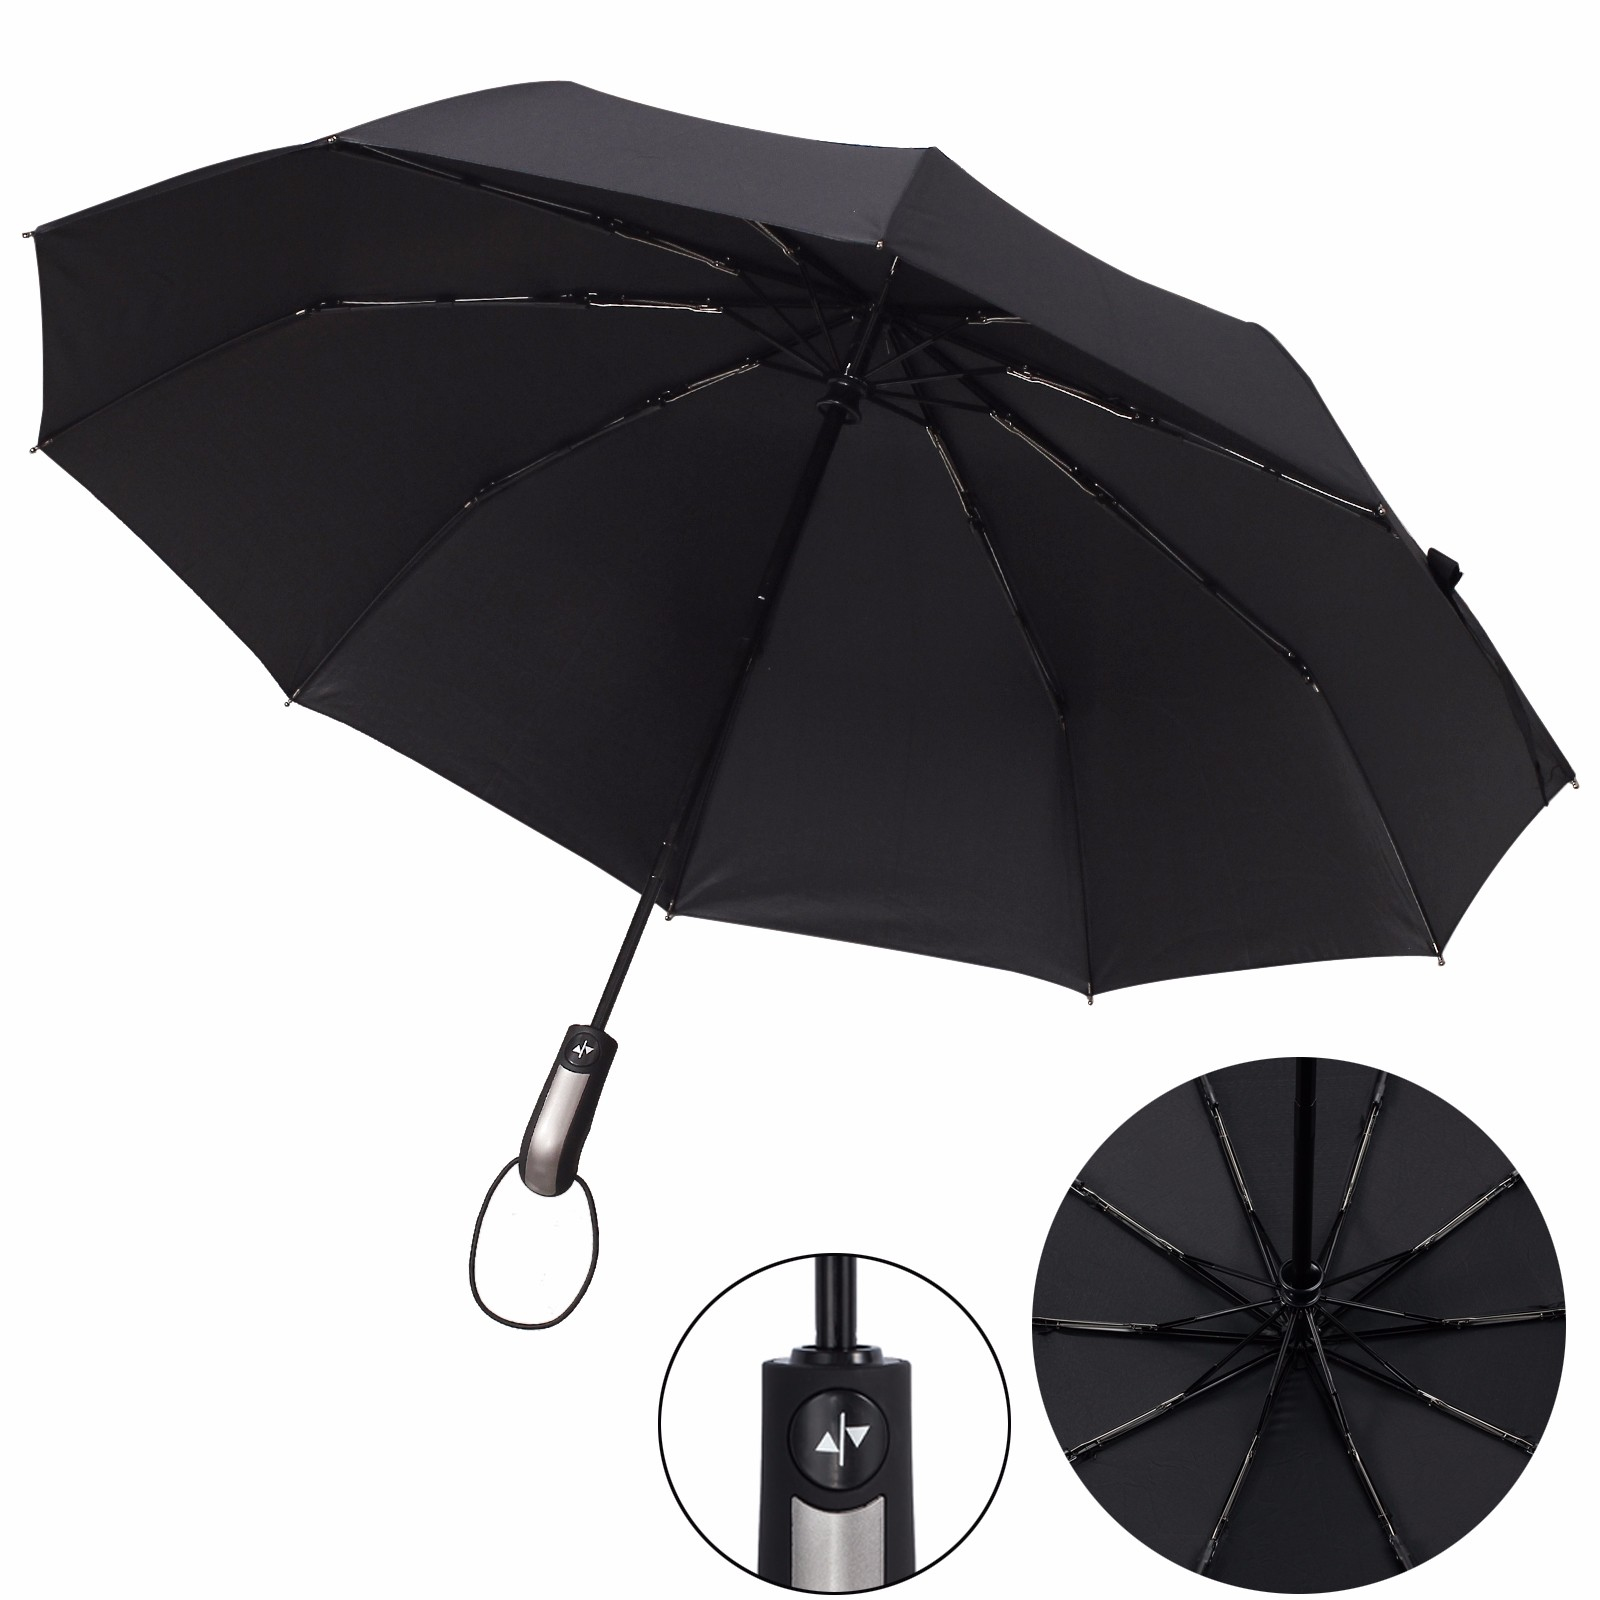 Mens Rain and Rain Umbrella RXY-UMBRELLA Fully Automatic Collapsible Umbrella Color : B